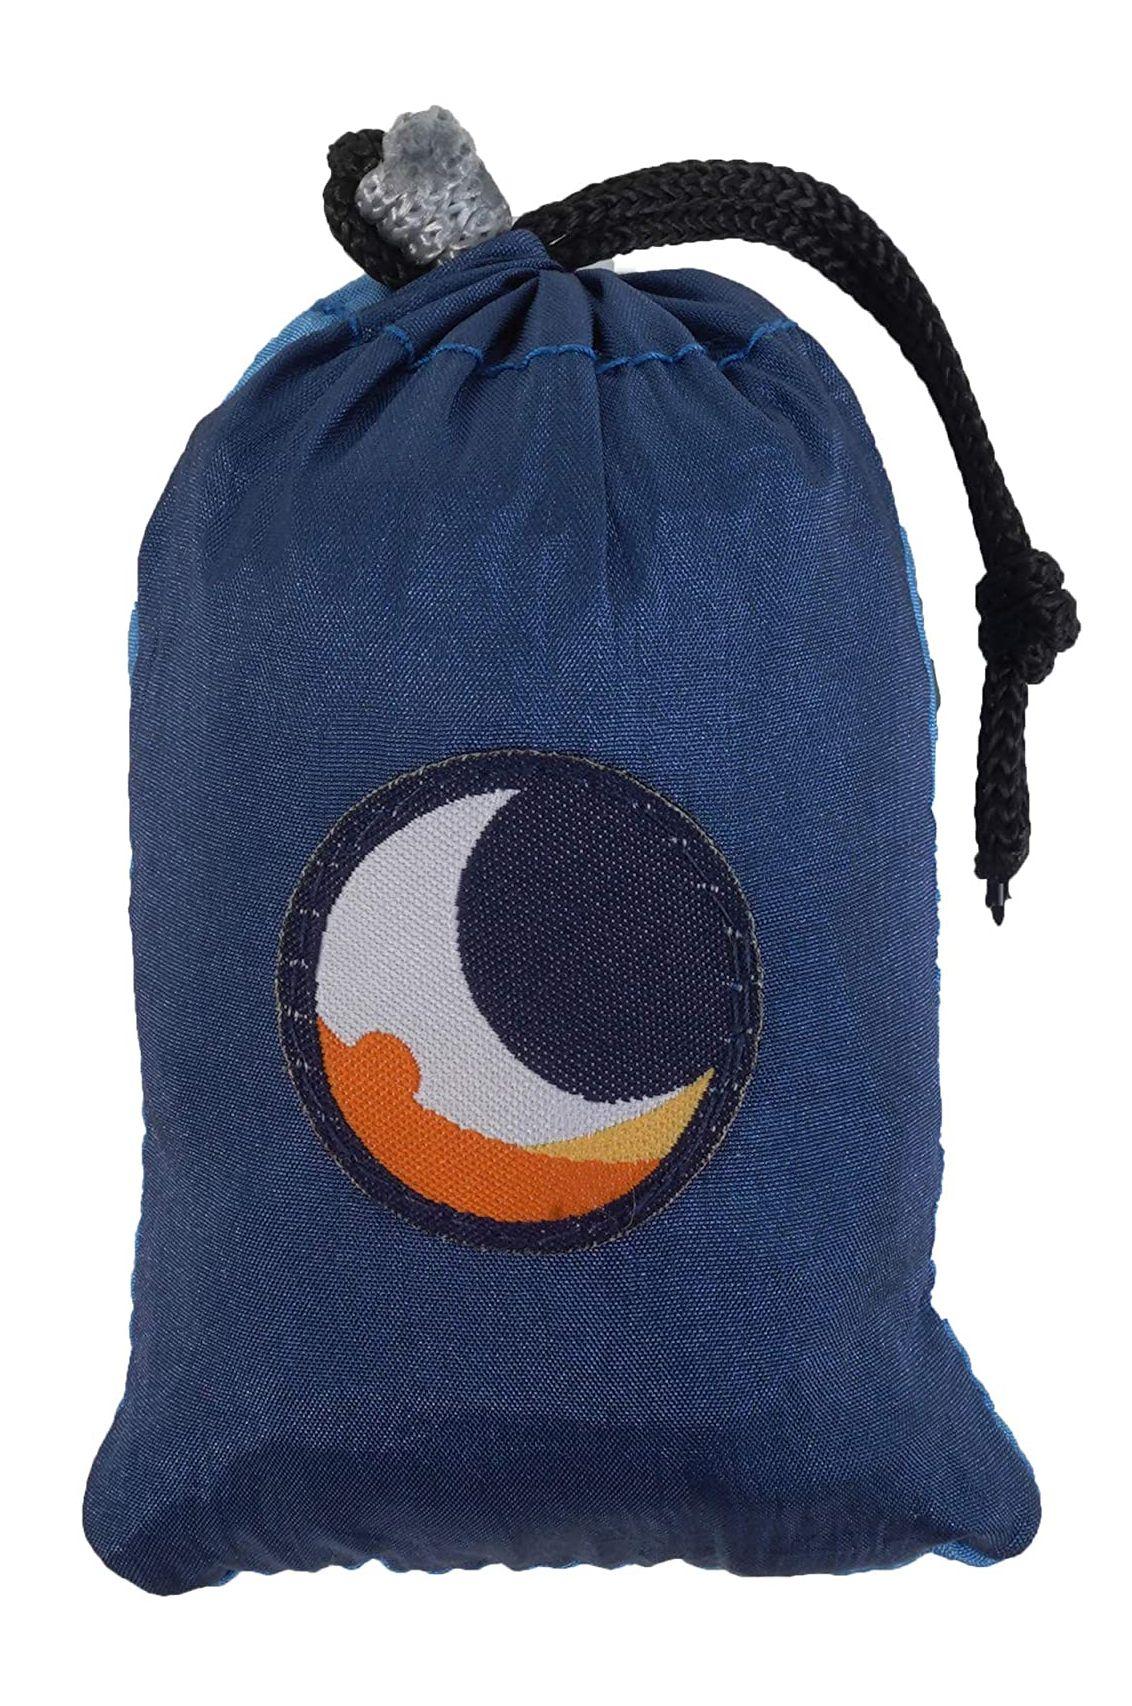 Saco Ticket To The Moon ECO BAG MEDIUM Royal Blue/Light Blue